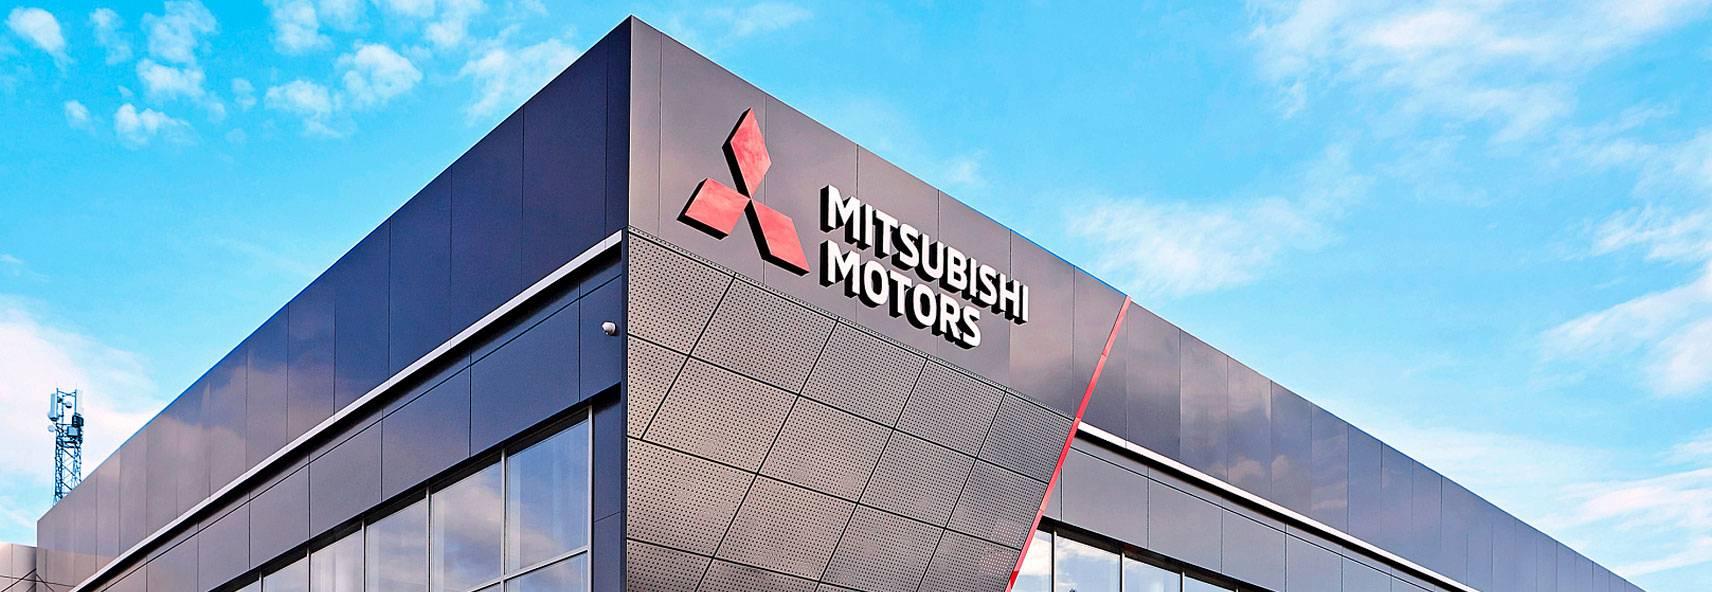 Mitsubishi, Дзержинского